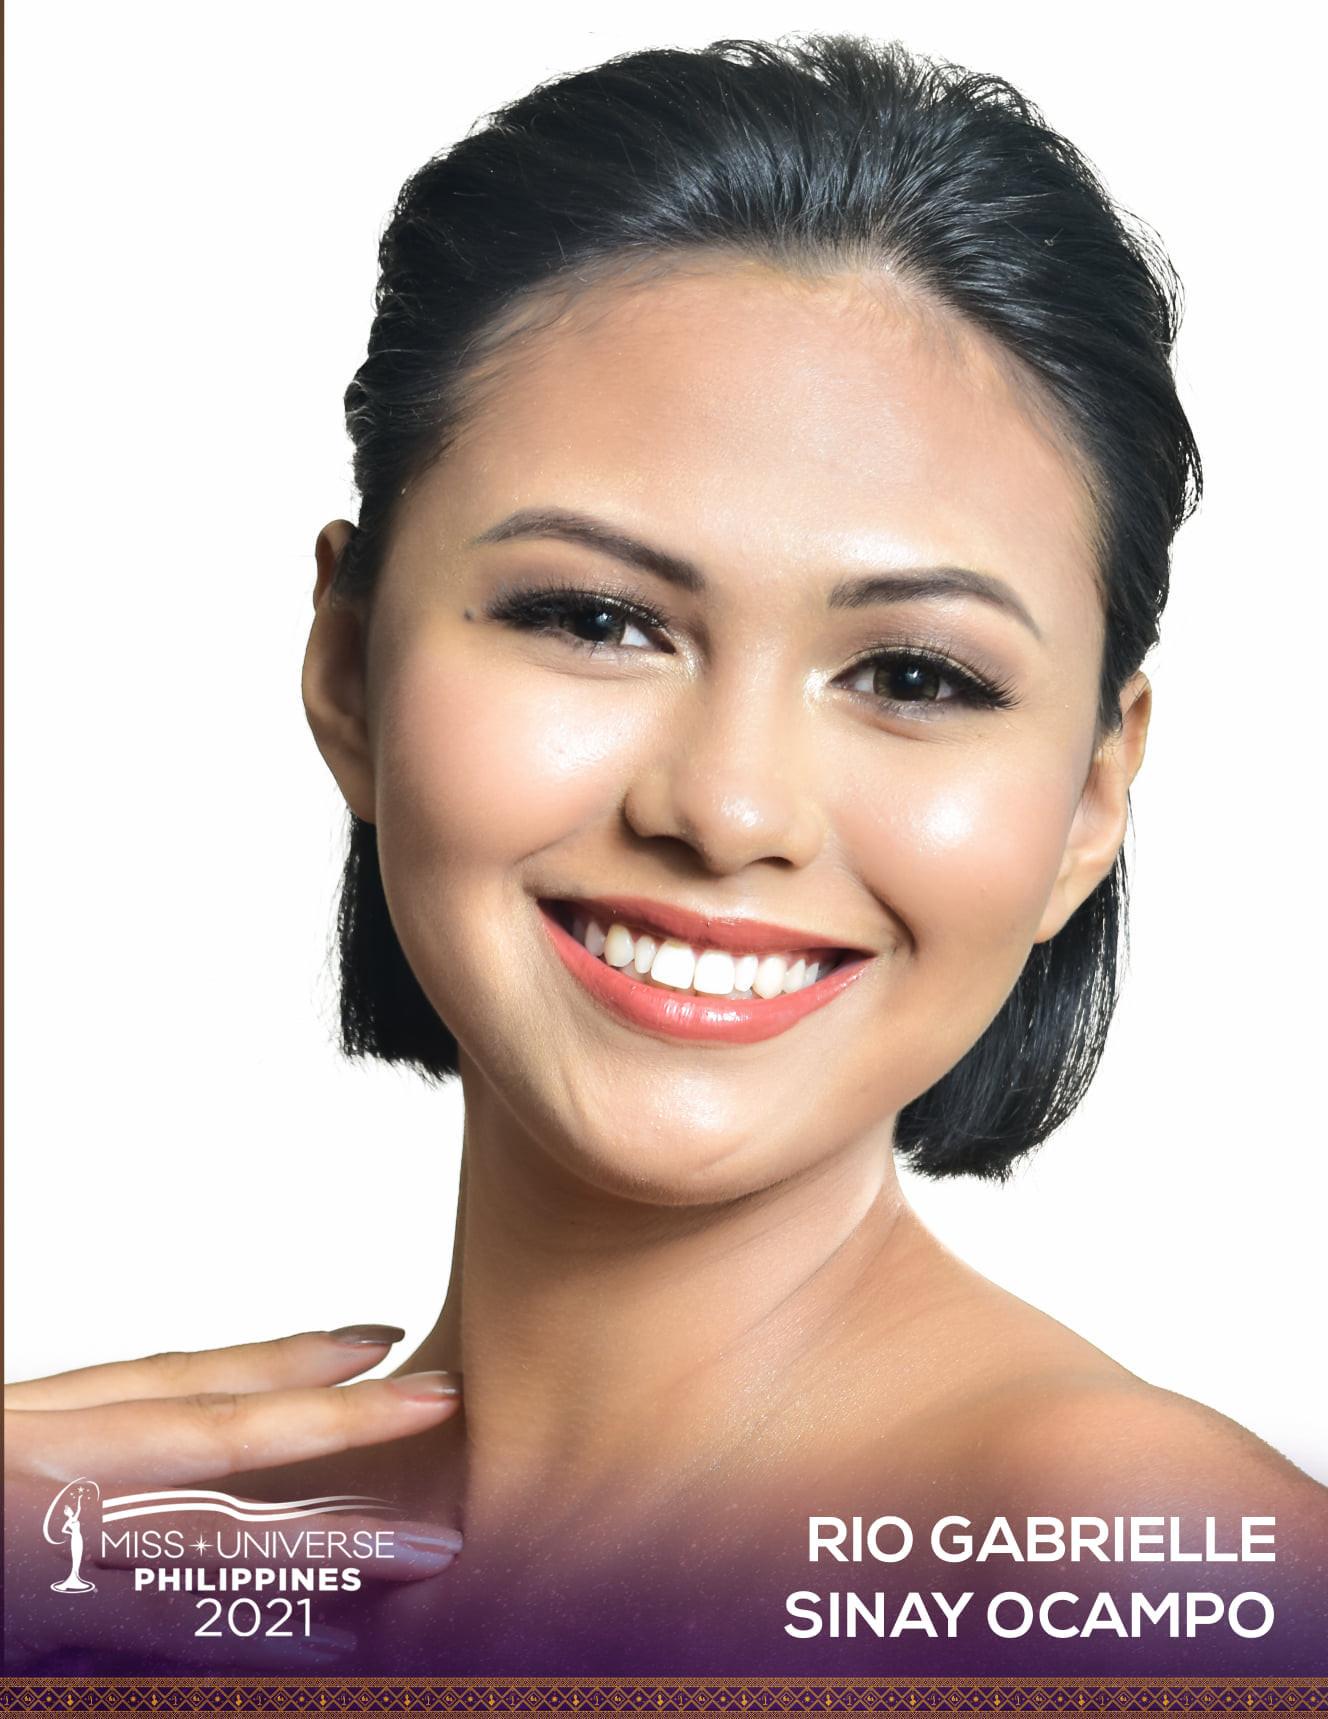 pre-candidatas a miss universe philippines 2021. - Página 5 AlaYiB